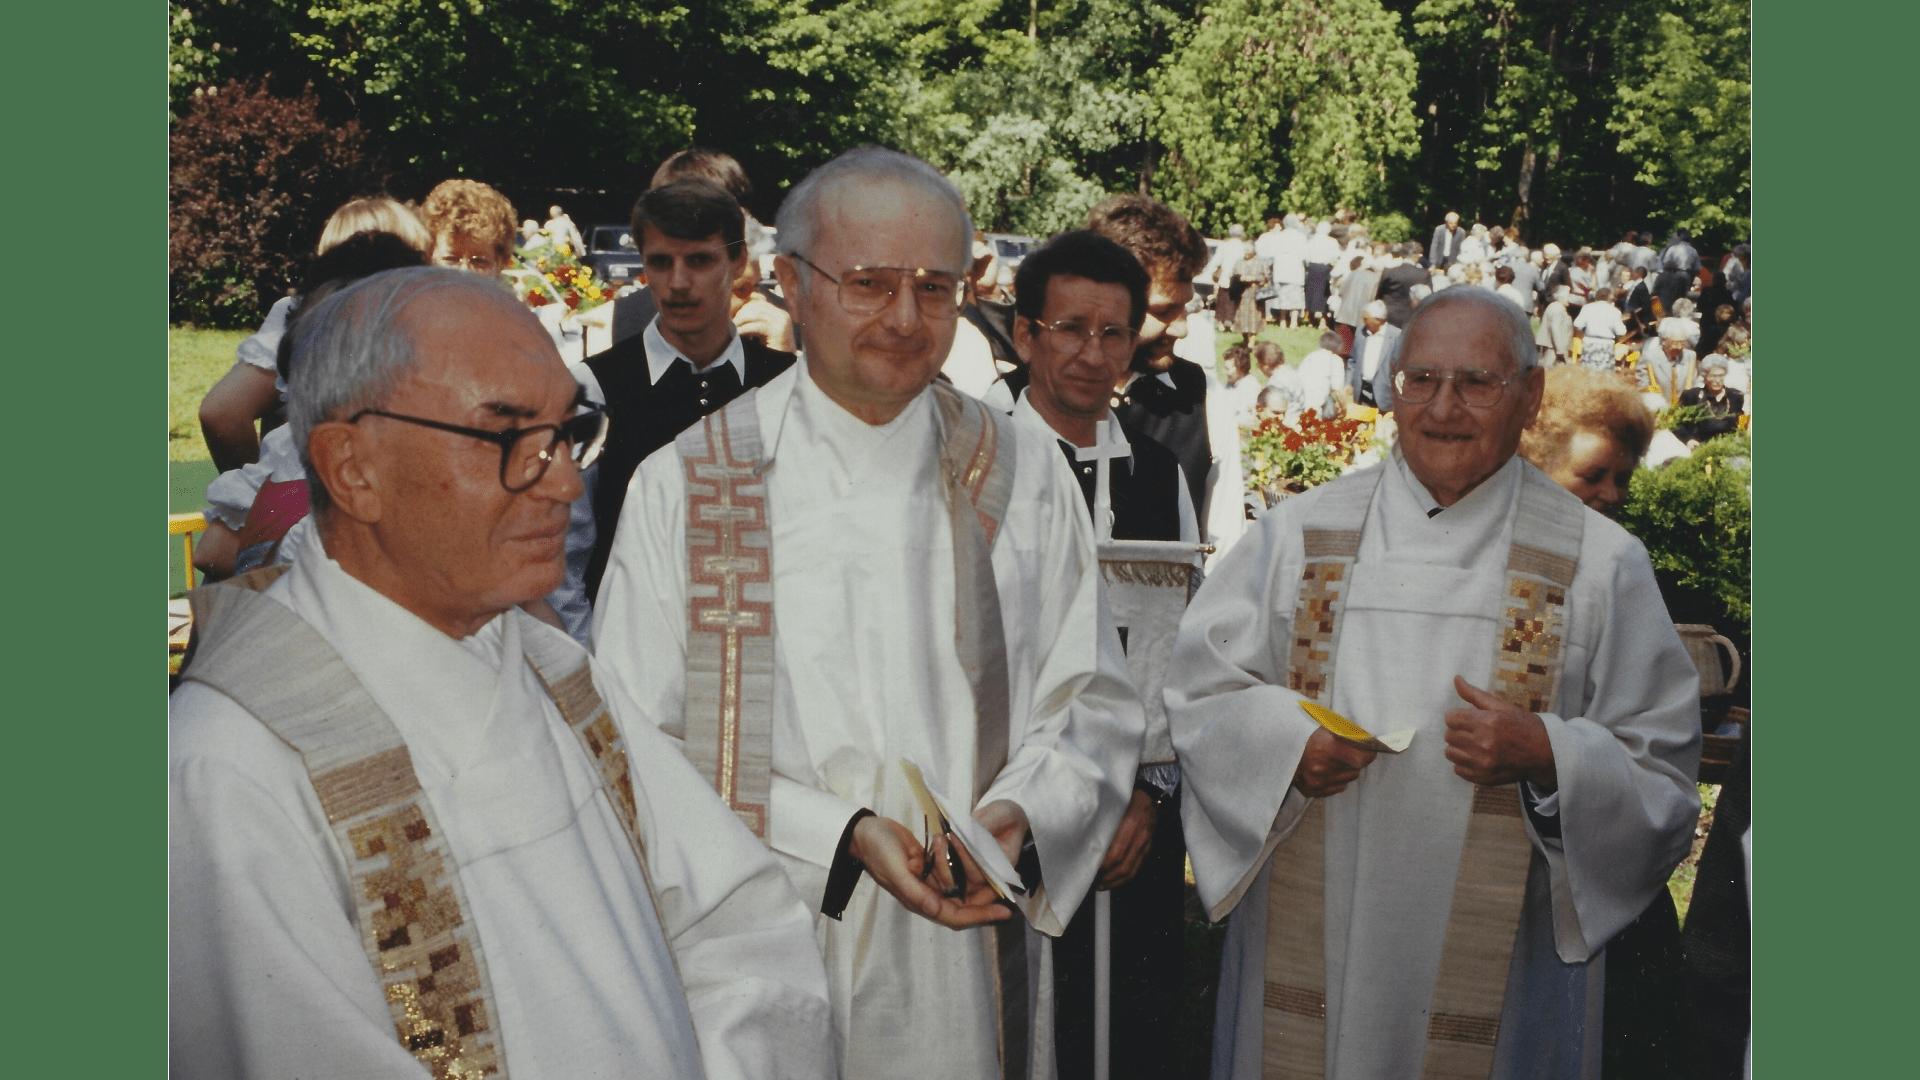 Wallfahrt Christi Himmelfahrt 1993 - Prälat Dr. Robert Zollitsch, P. Philipp Johler SJ, Pfarrer Andreas Moschina. Foto: Archiv Arme Schulschwestern